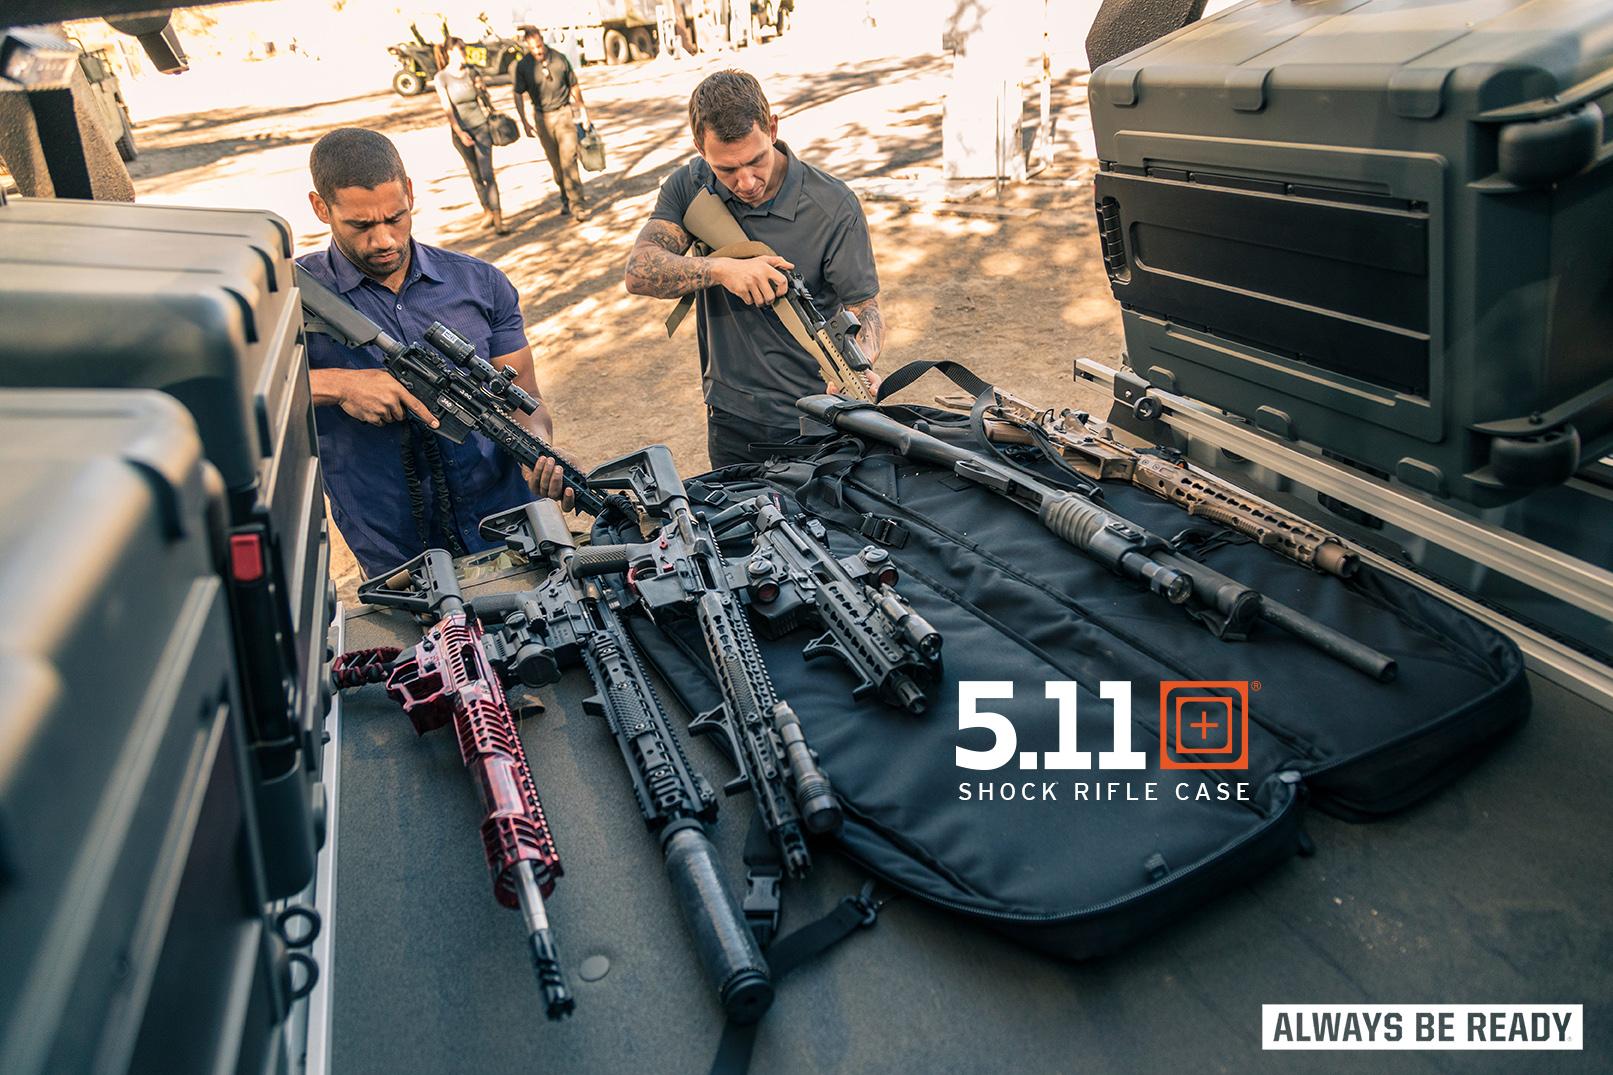 511 range day best range bag 42 and 36 inch shock case